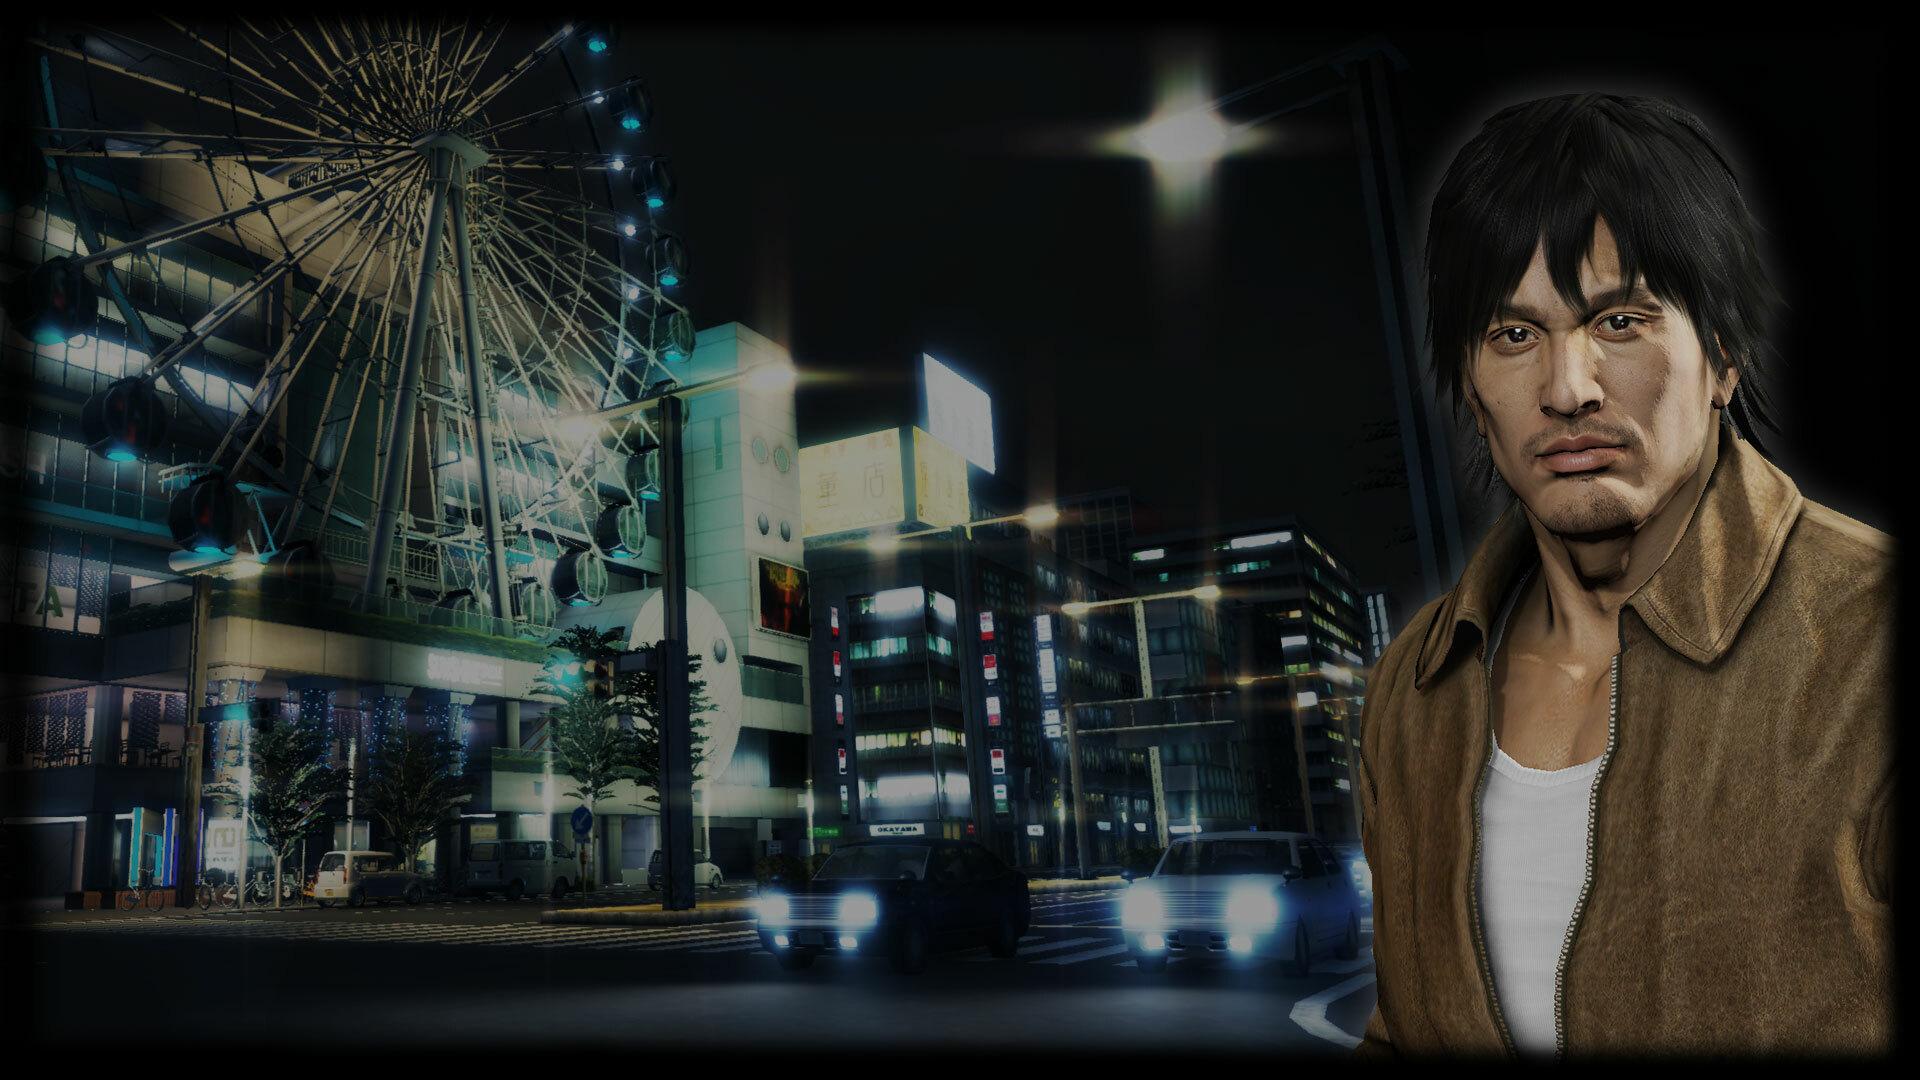 Tatsuo Shinada Background